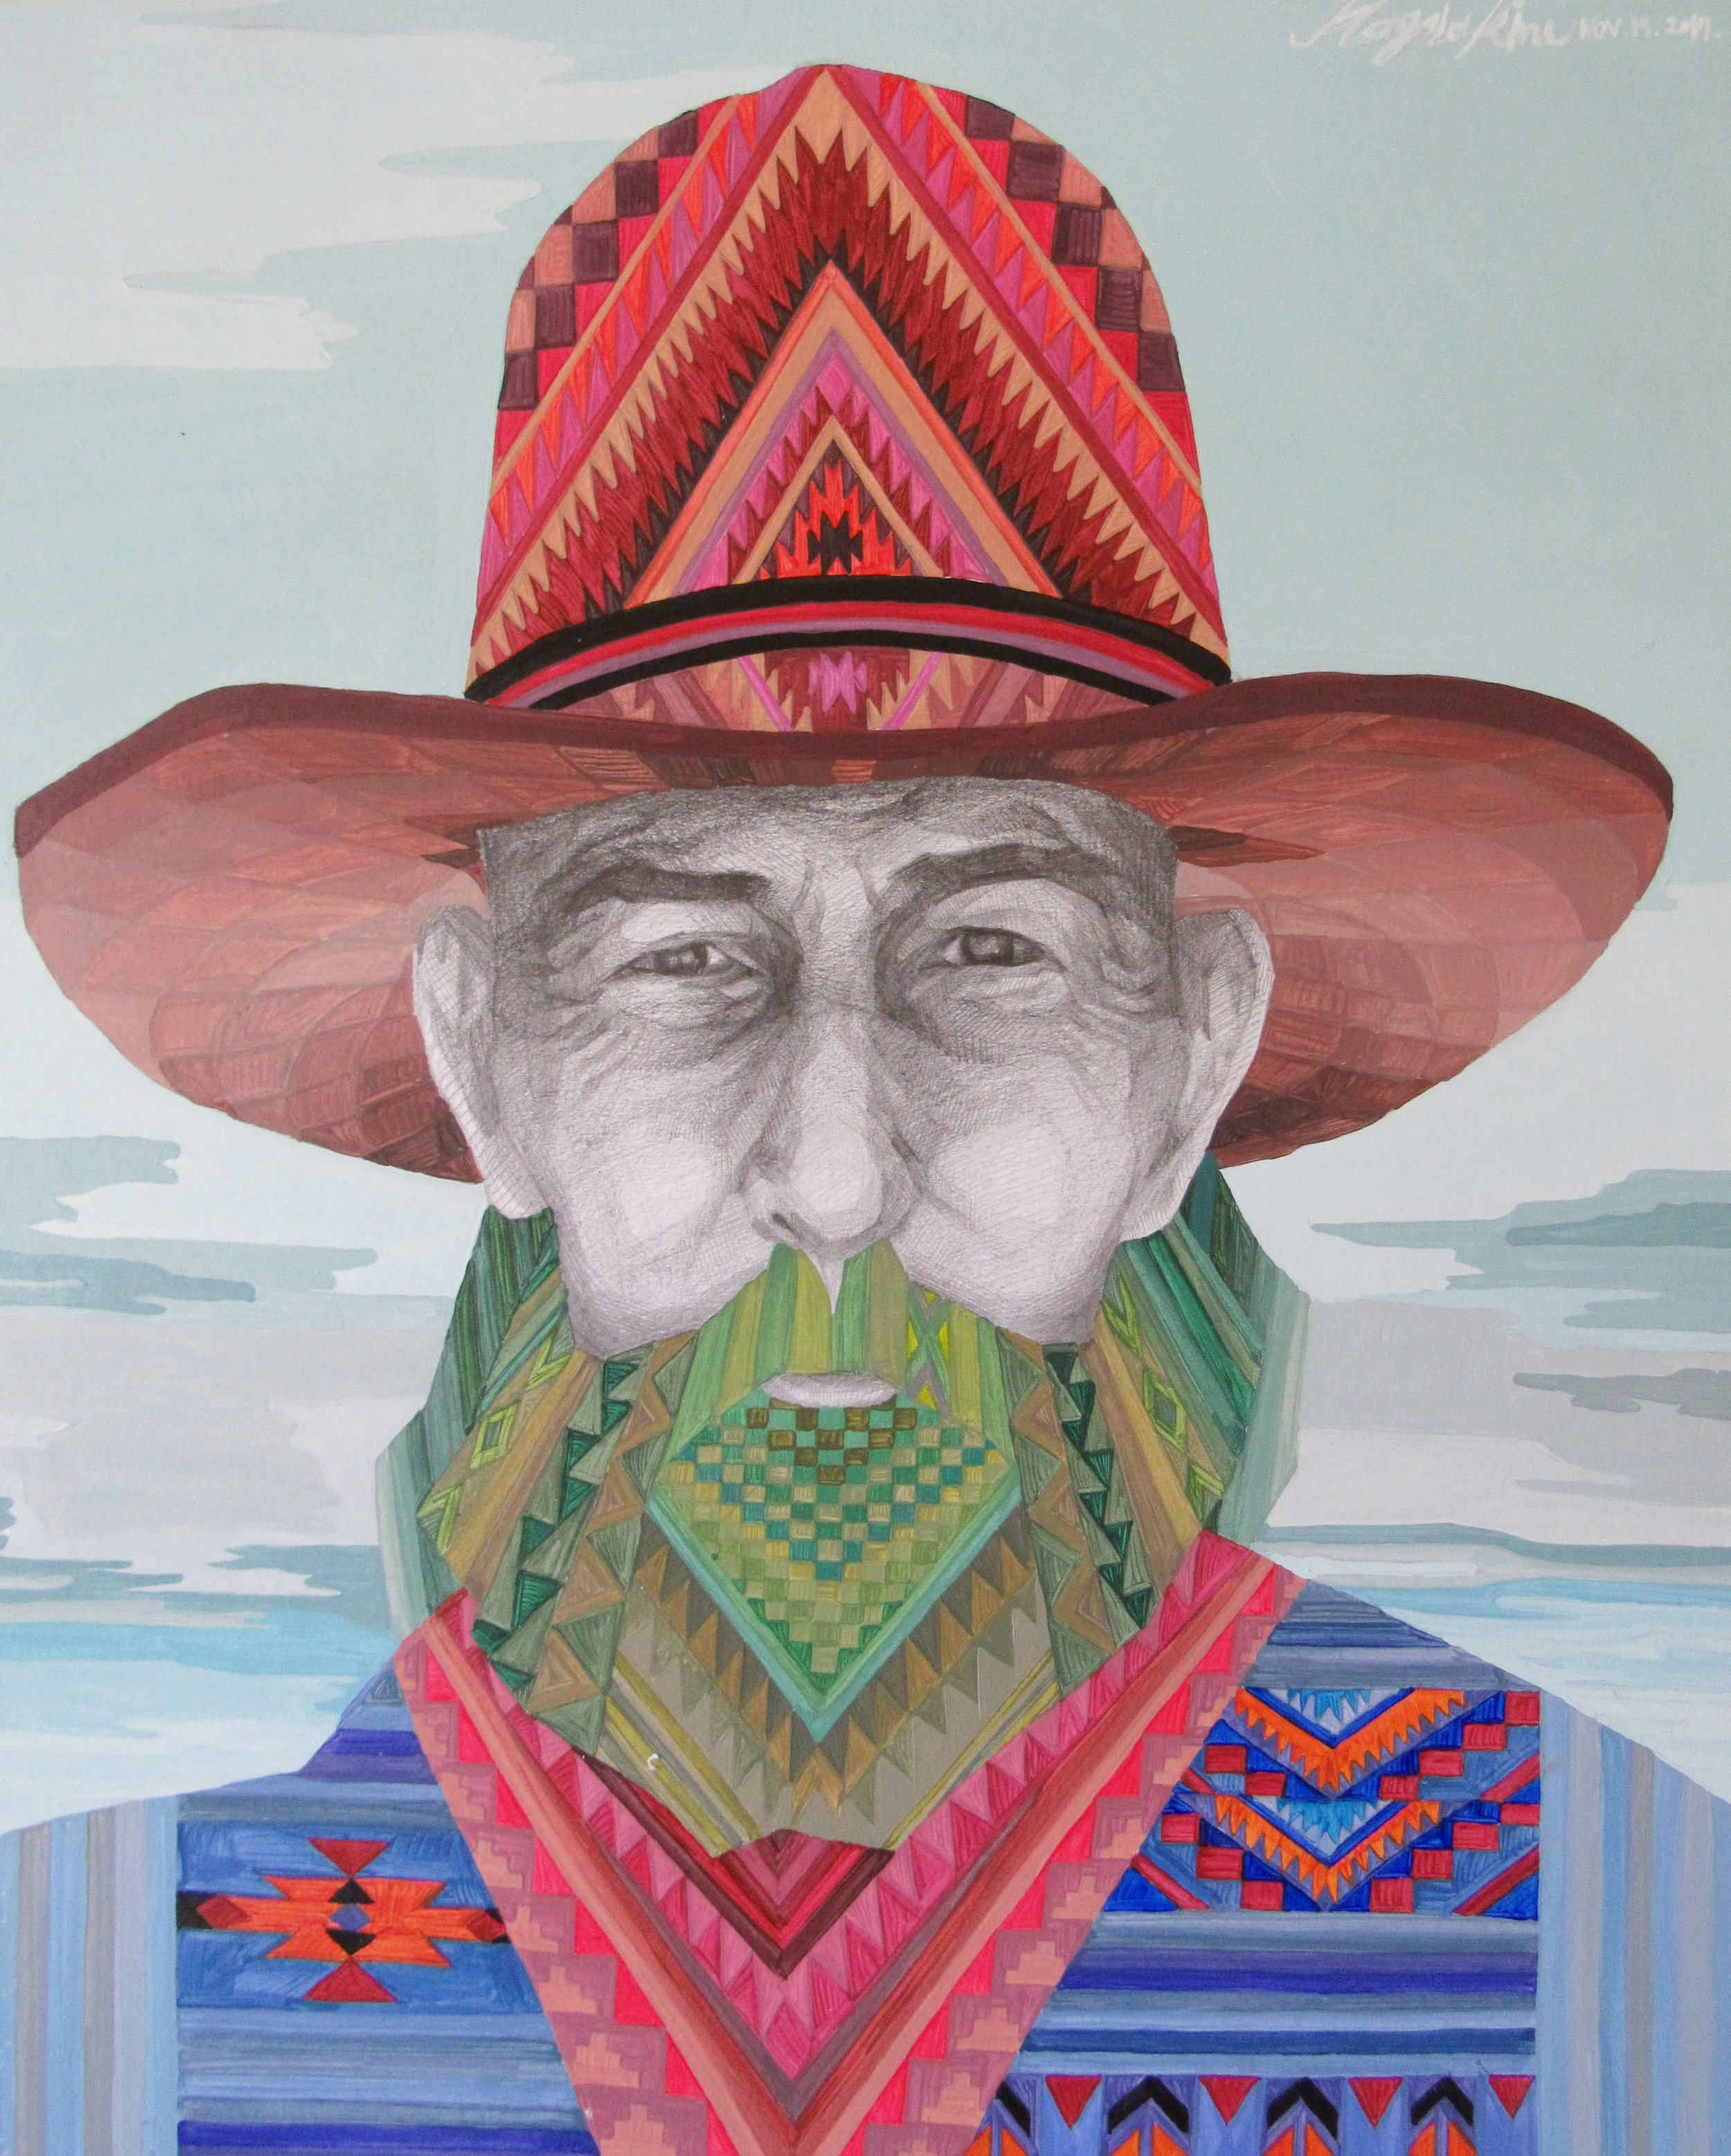 Sold - Colorfreak tribesman